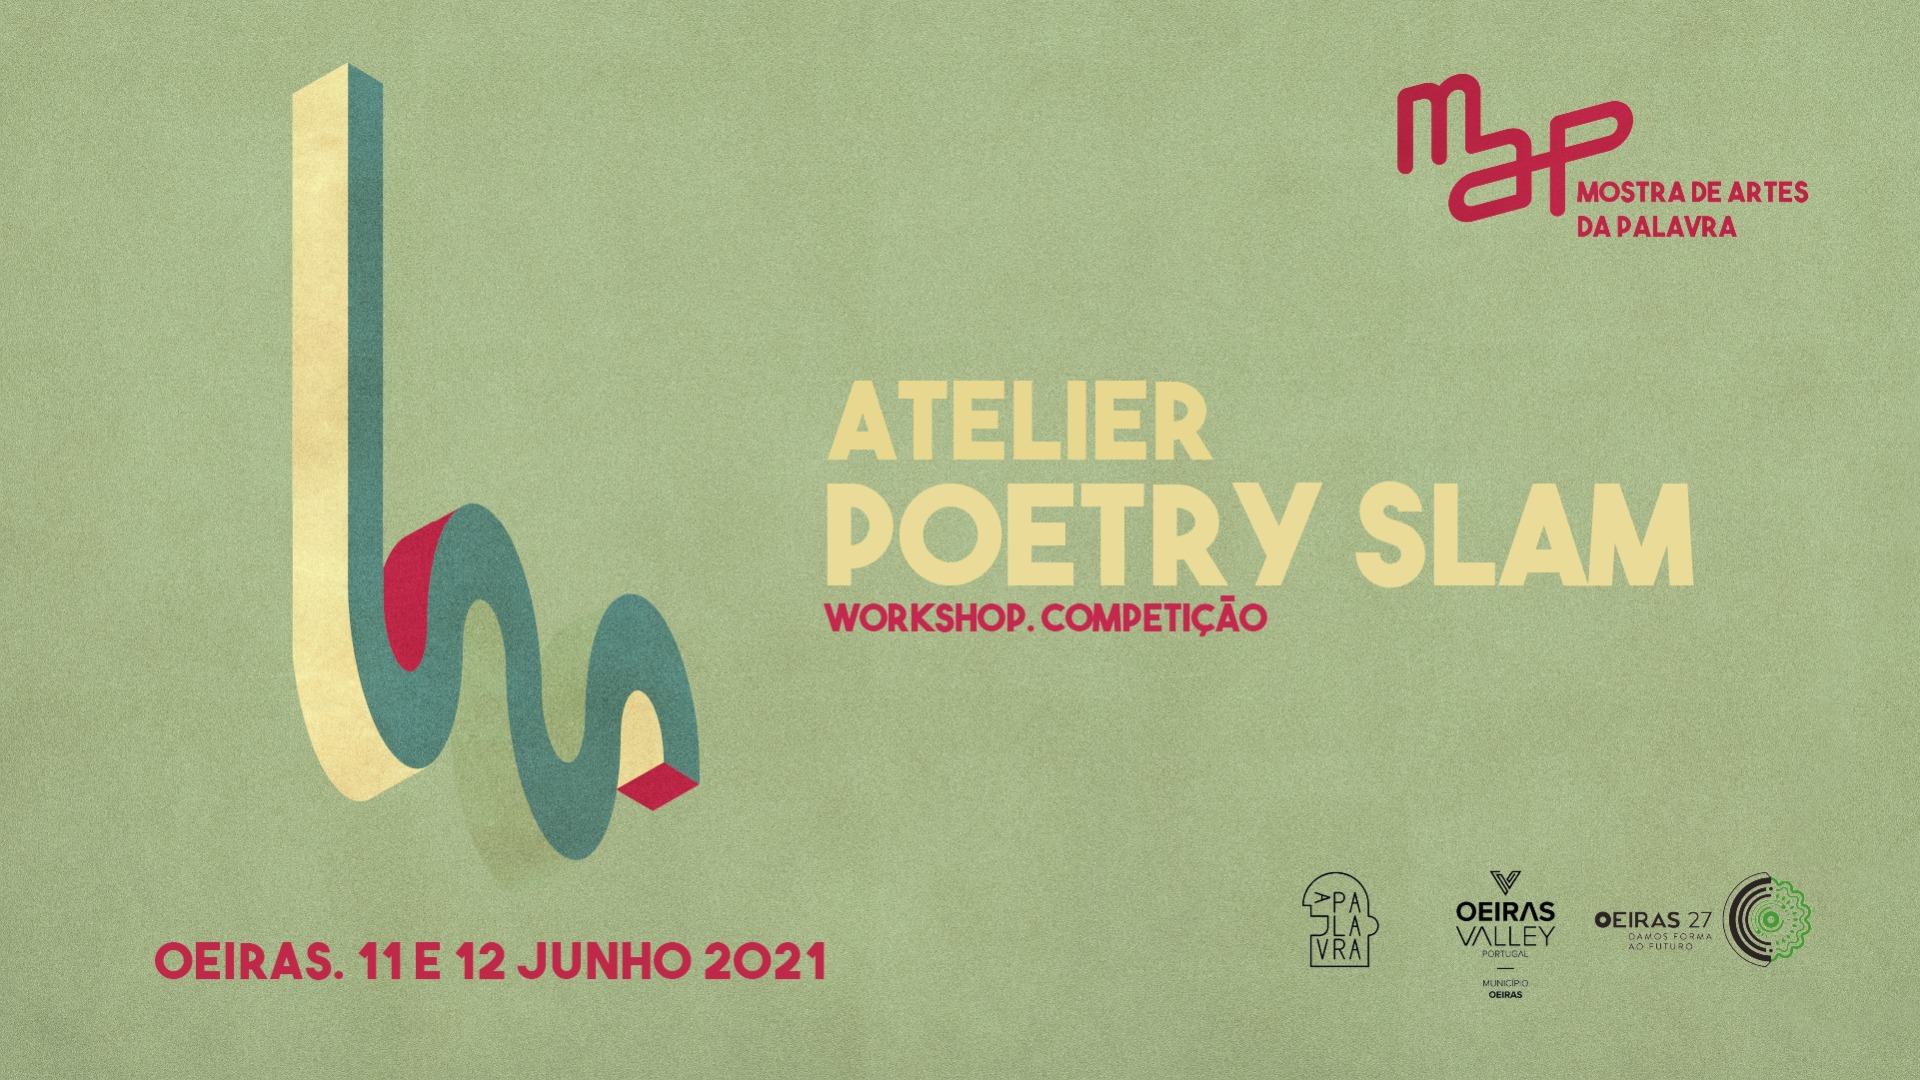 Atelier Poetry Slam